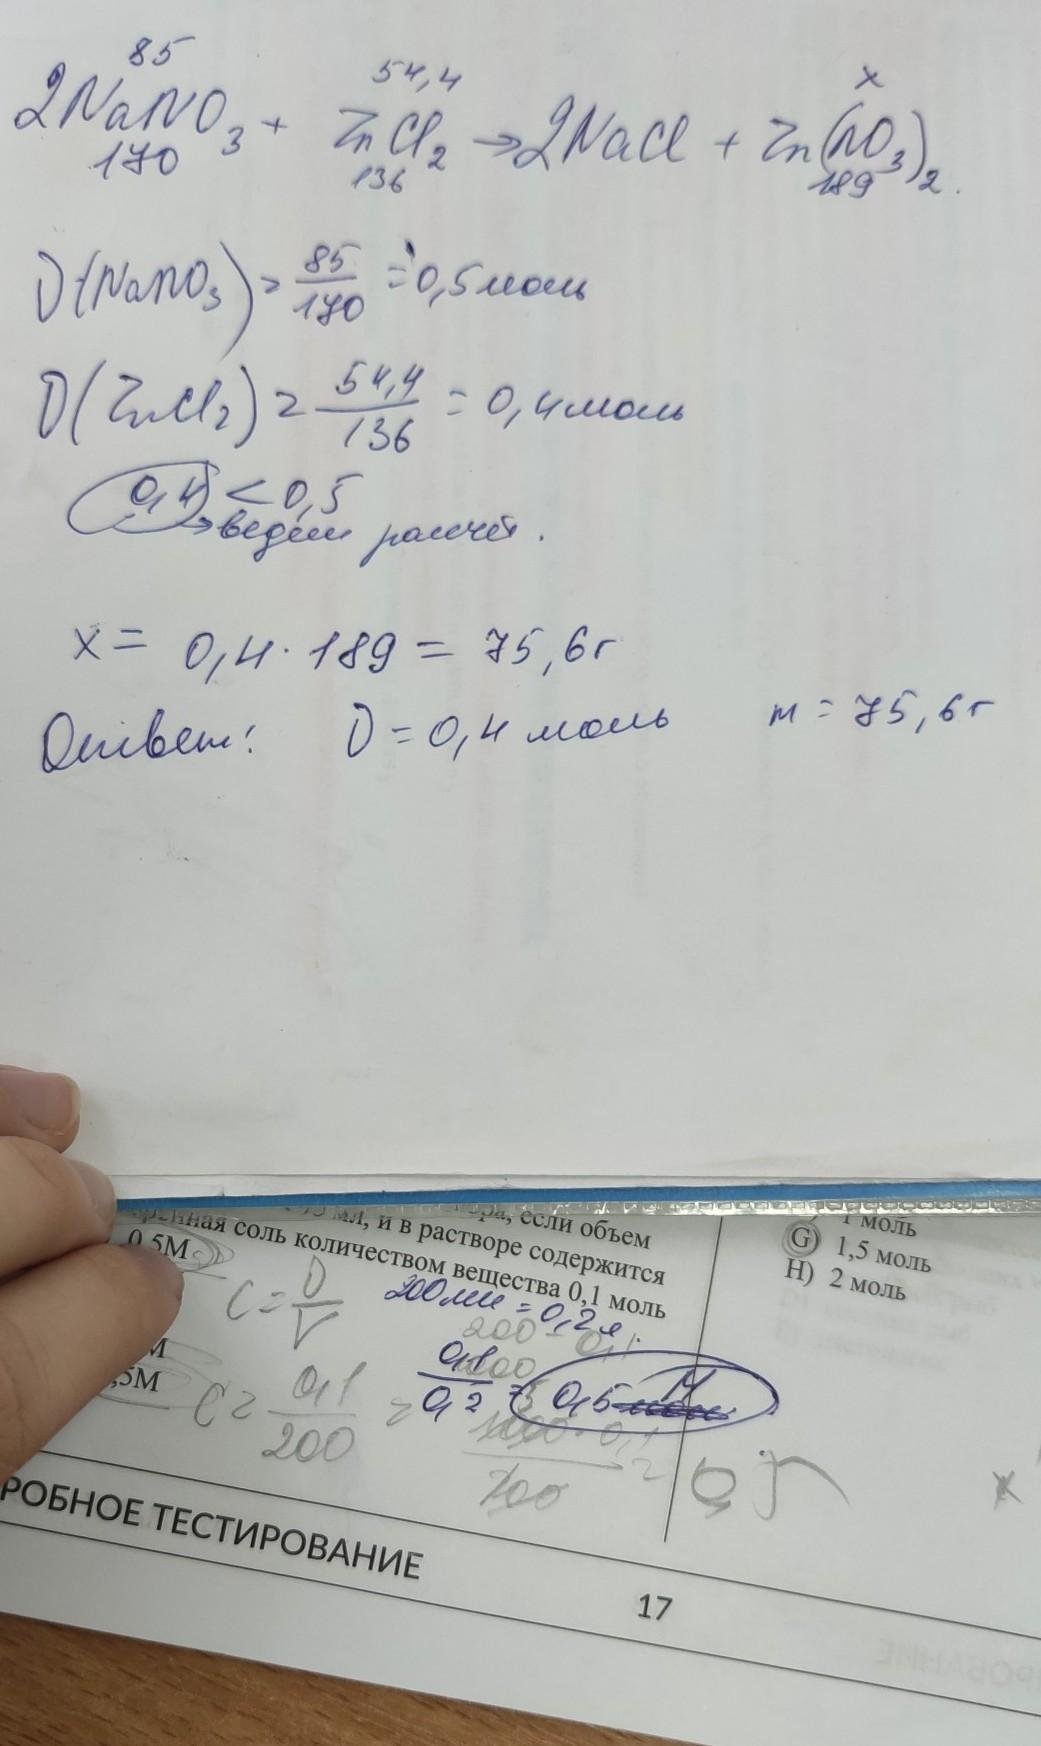 Определите массу и количество вещества нитрата